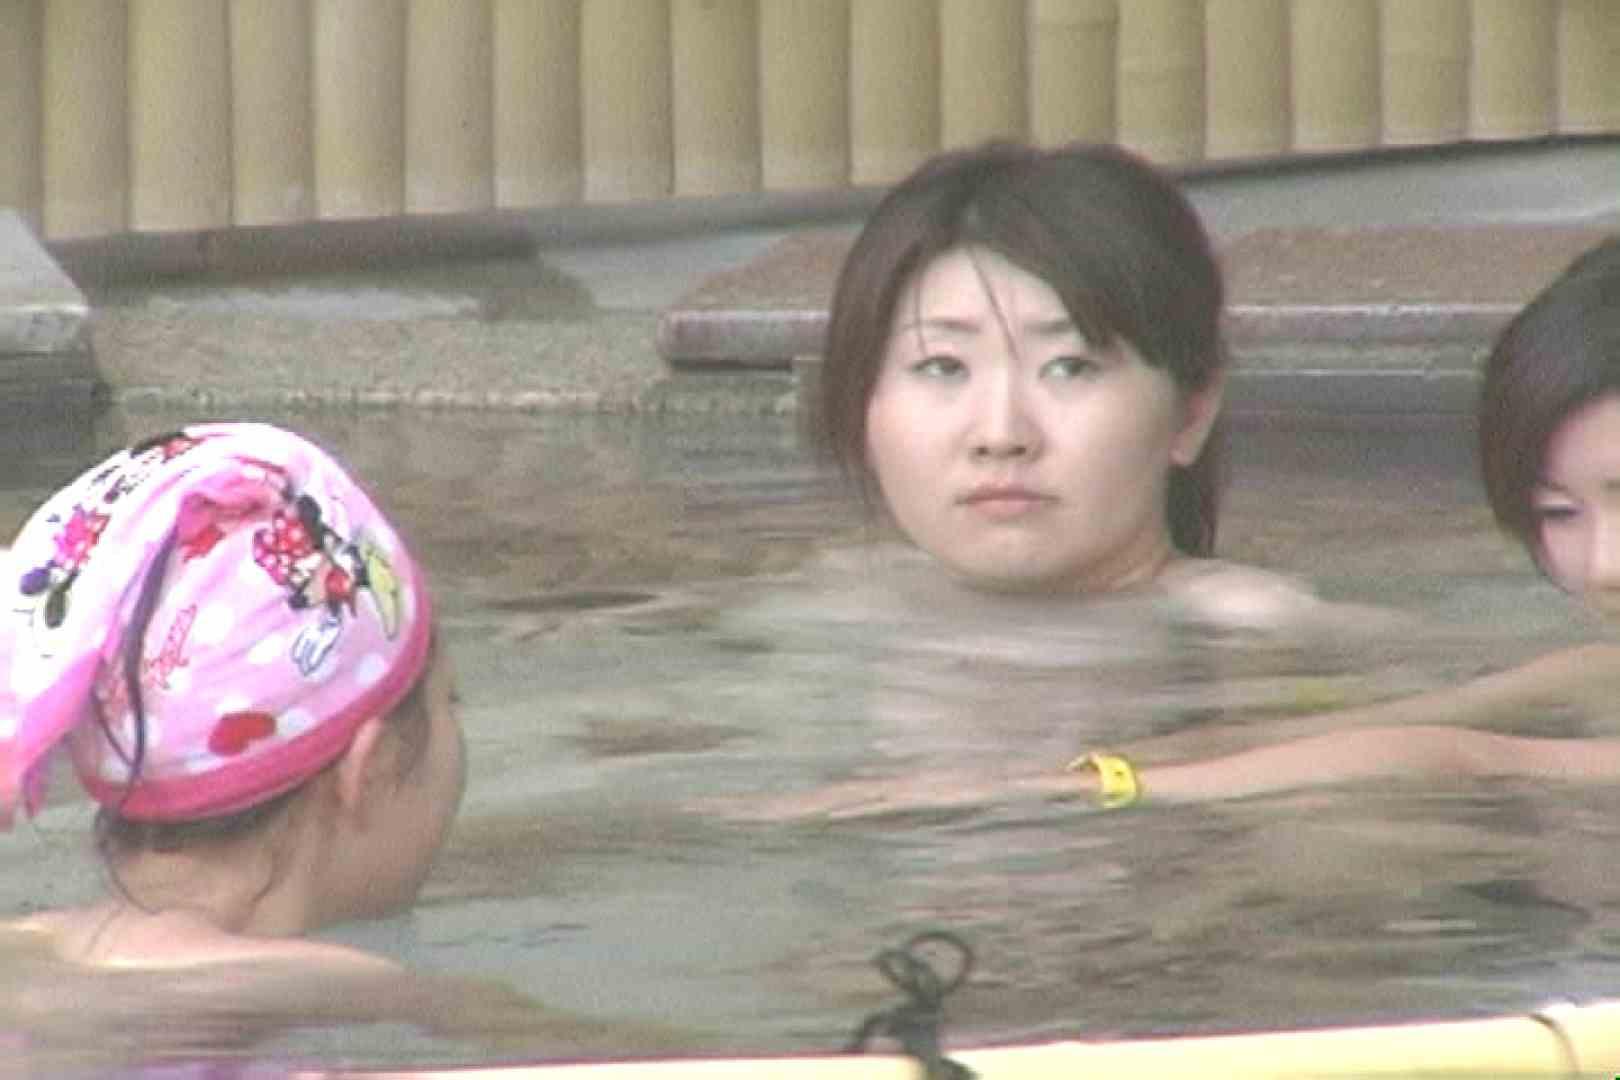 Aquaな露天風呂Vol.25 露天風呂編 | 盗撮シリーズ  91PIX 83